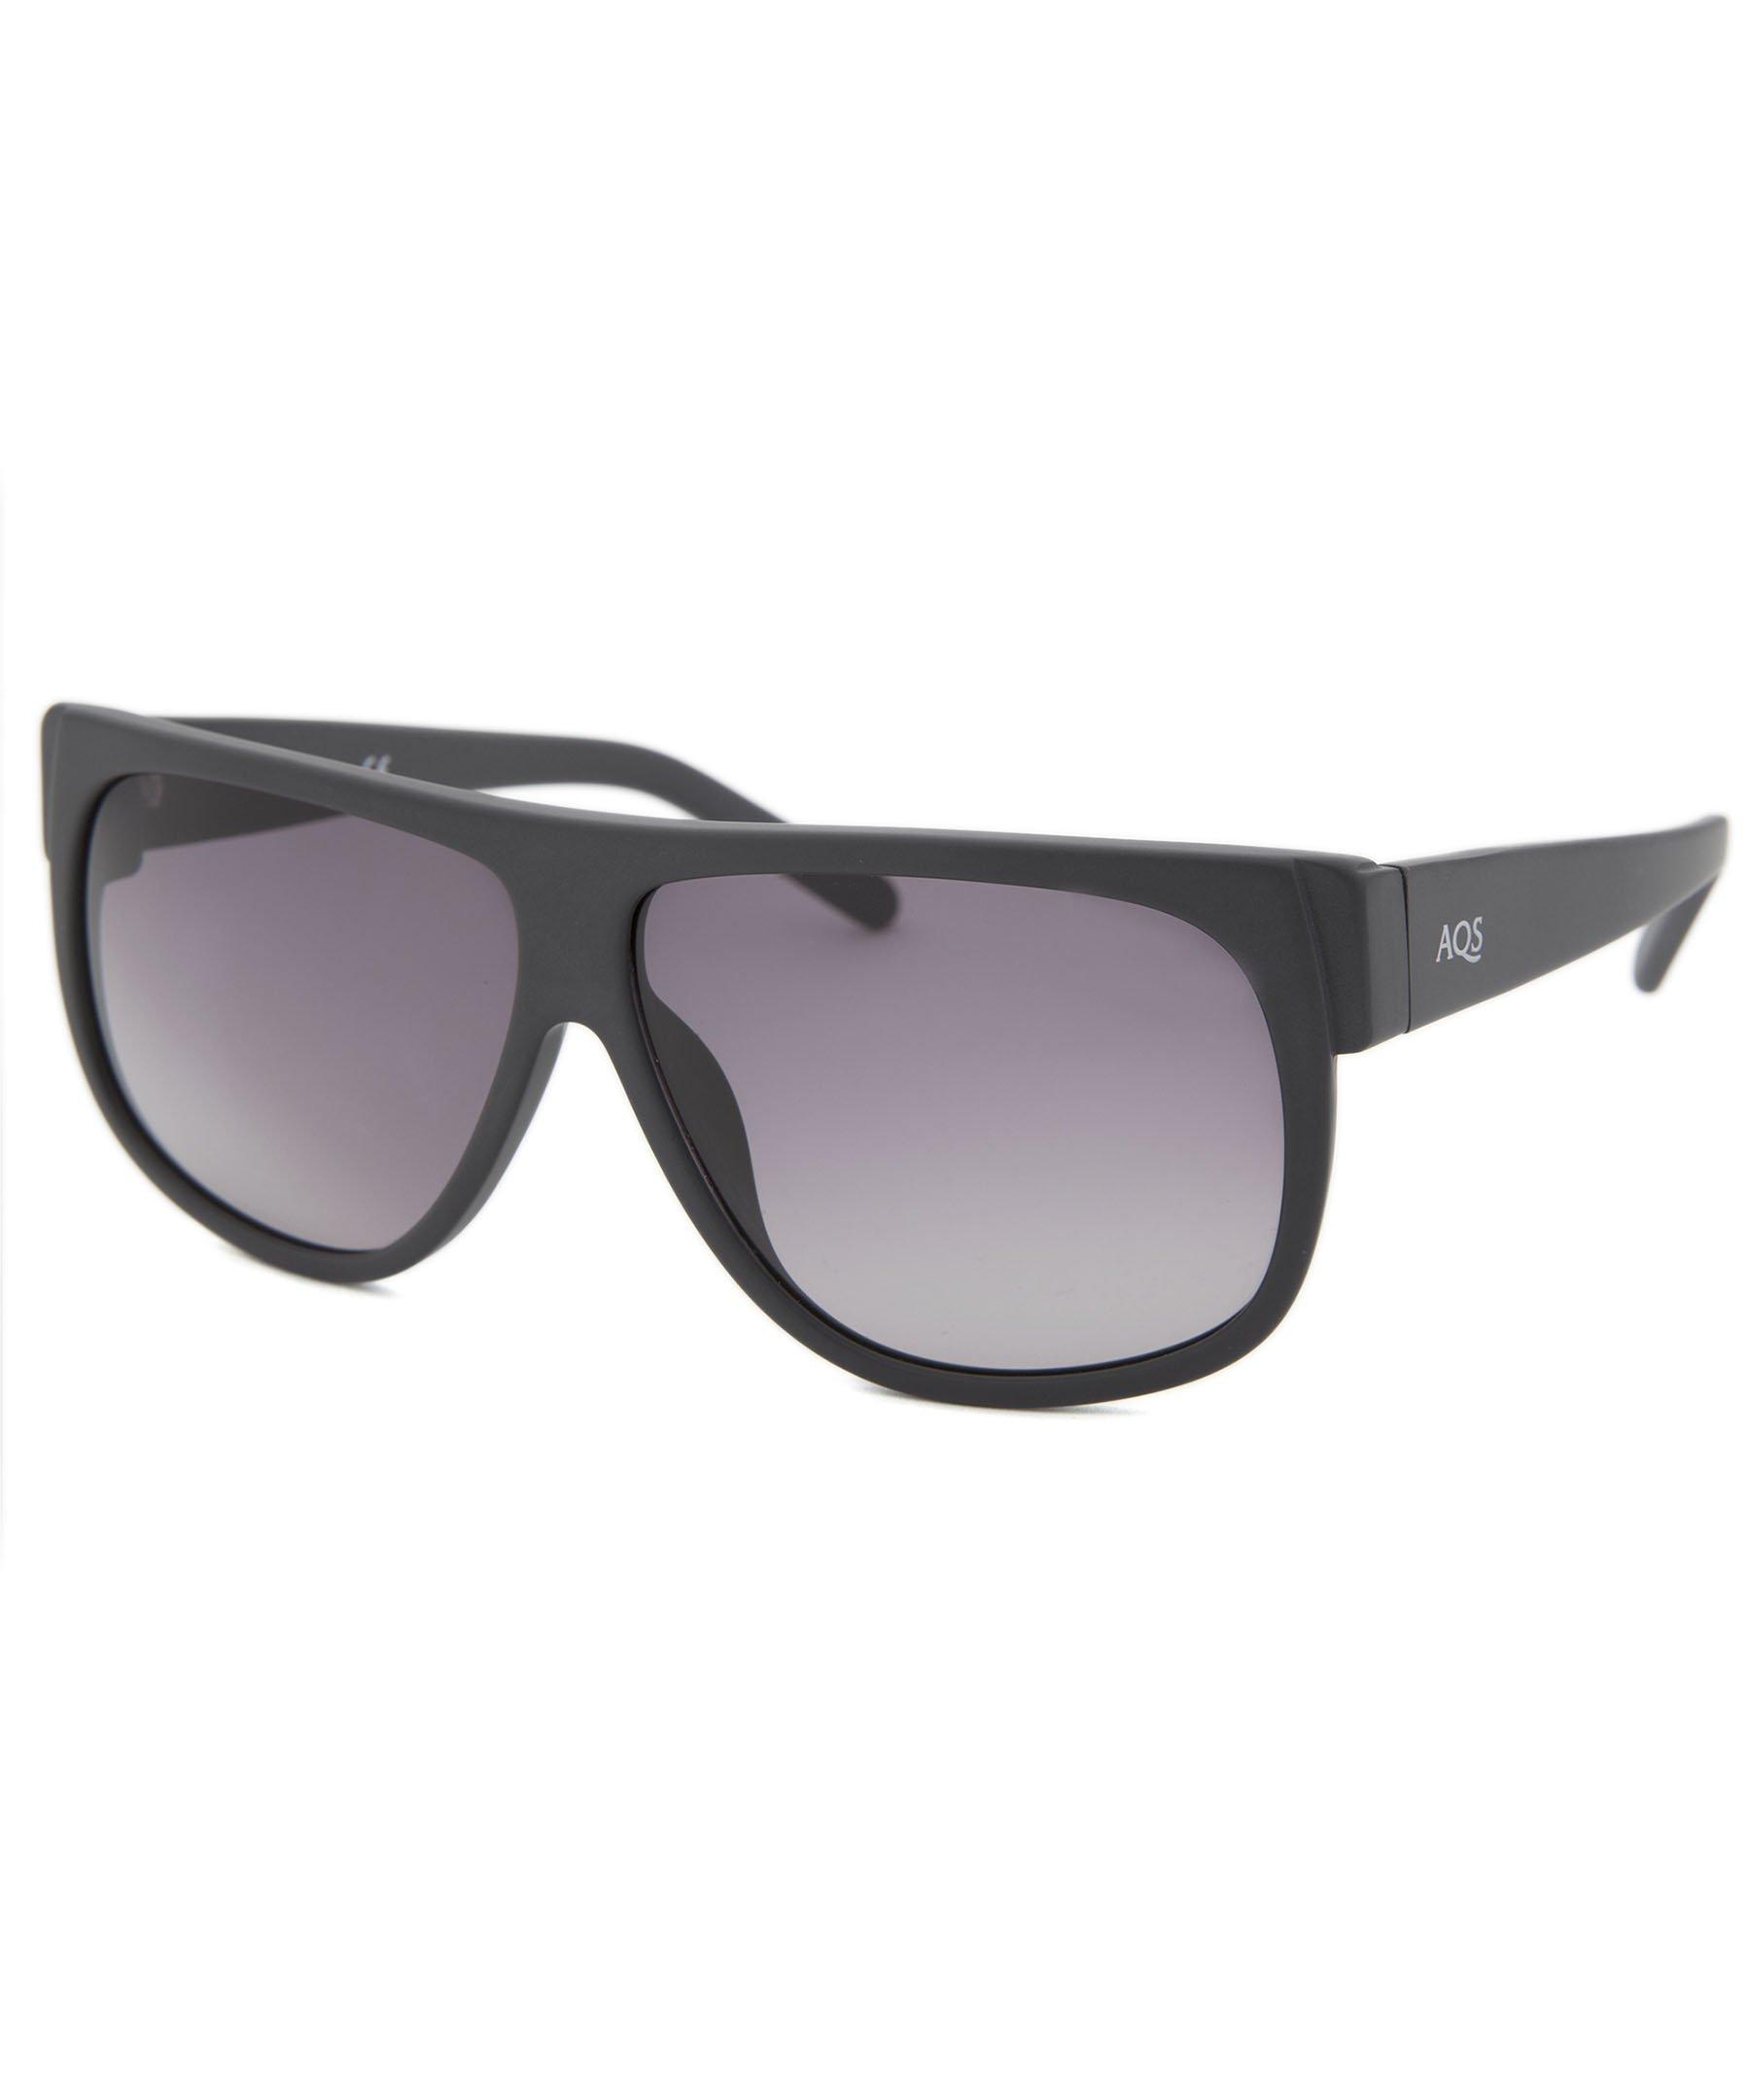 AQS Unisex Avery Flat Top Sunglasses (Matte Grey, Grey)